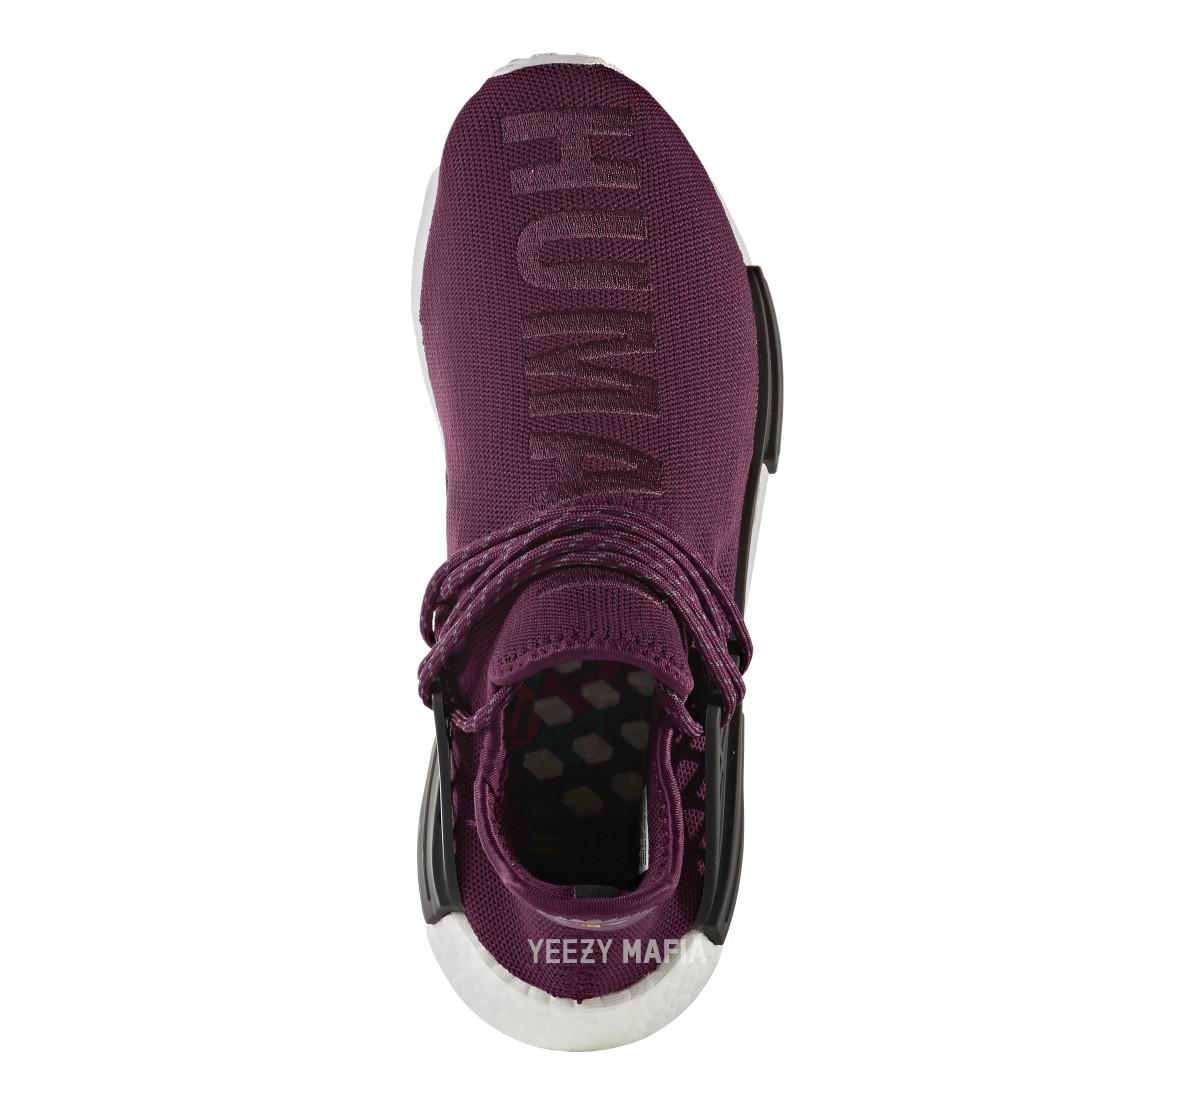 Adidas NMD Pharrell Noble Crimson bb0617 Top